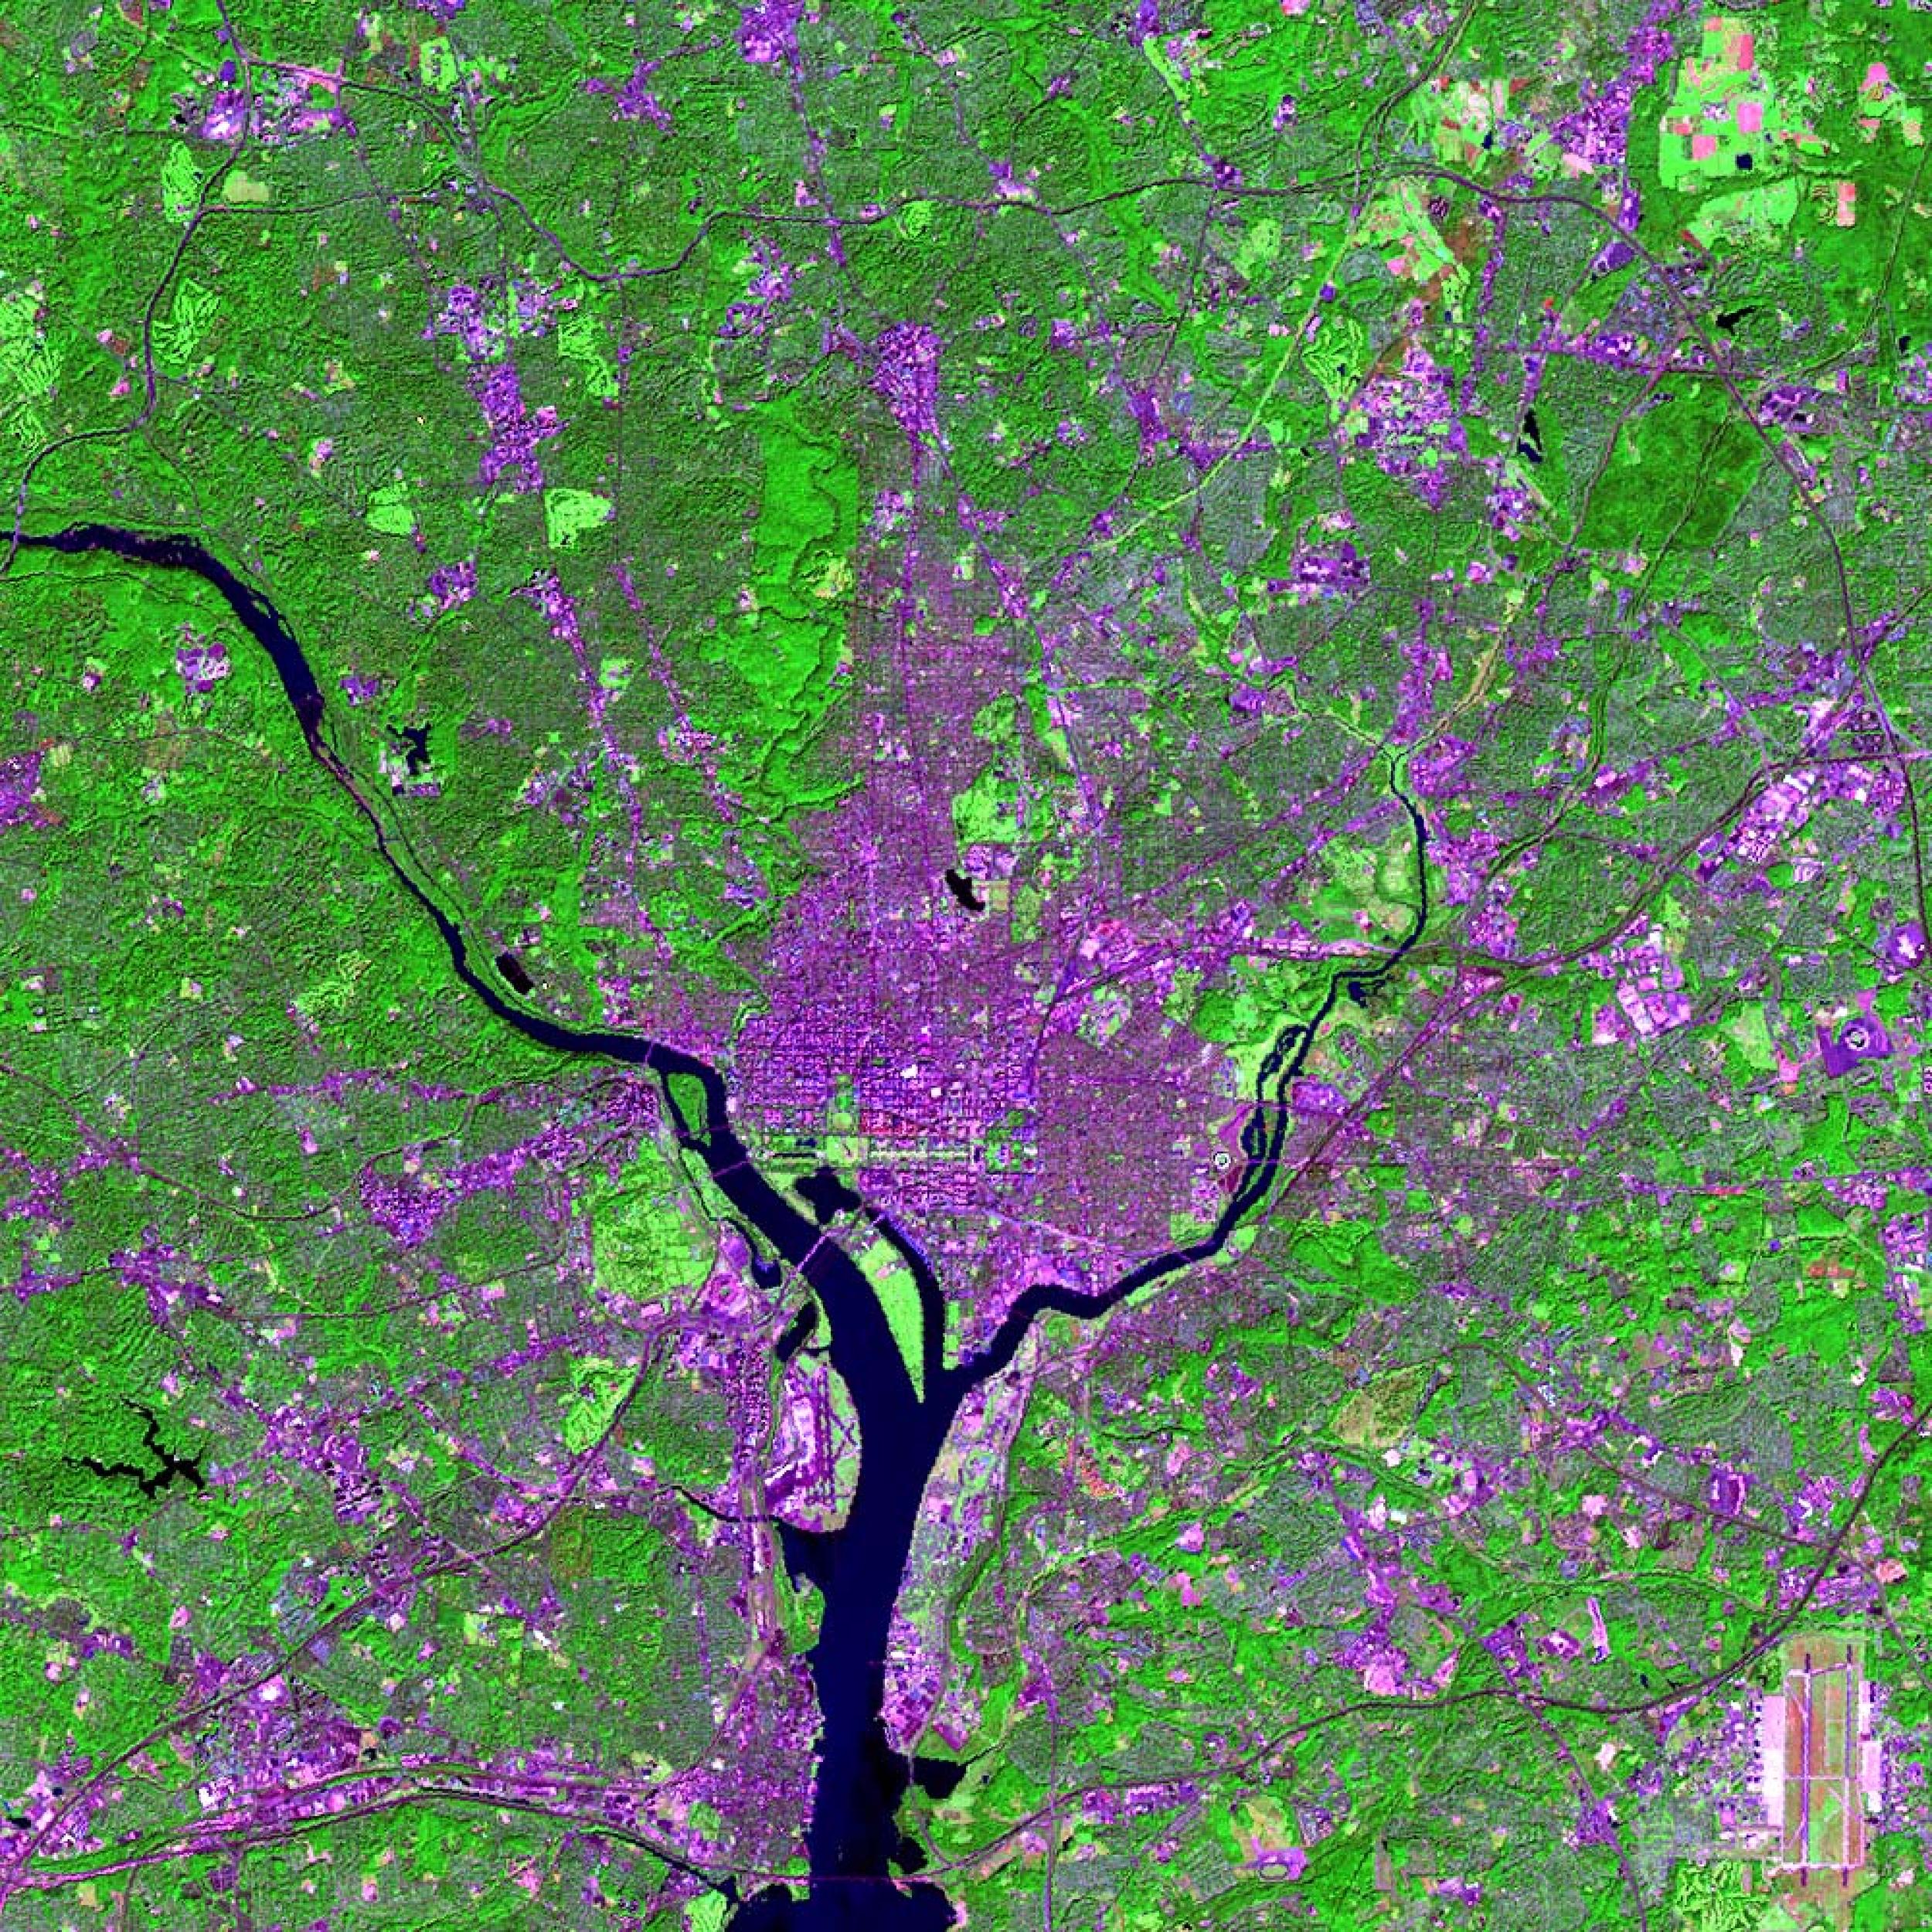 washington_dc from space (nasa)